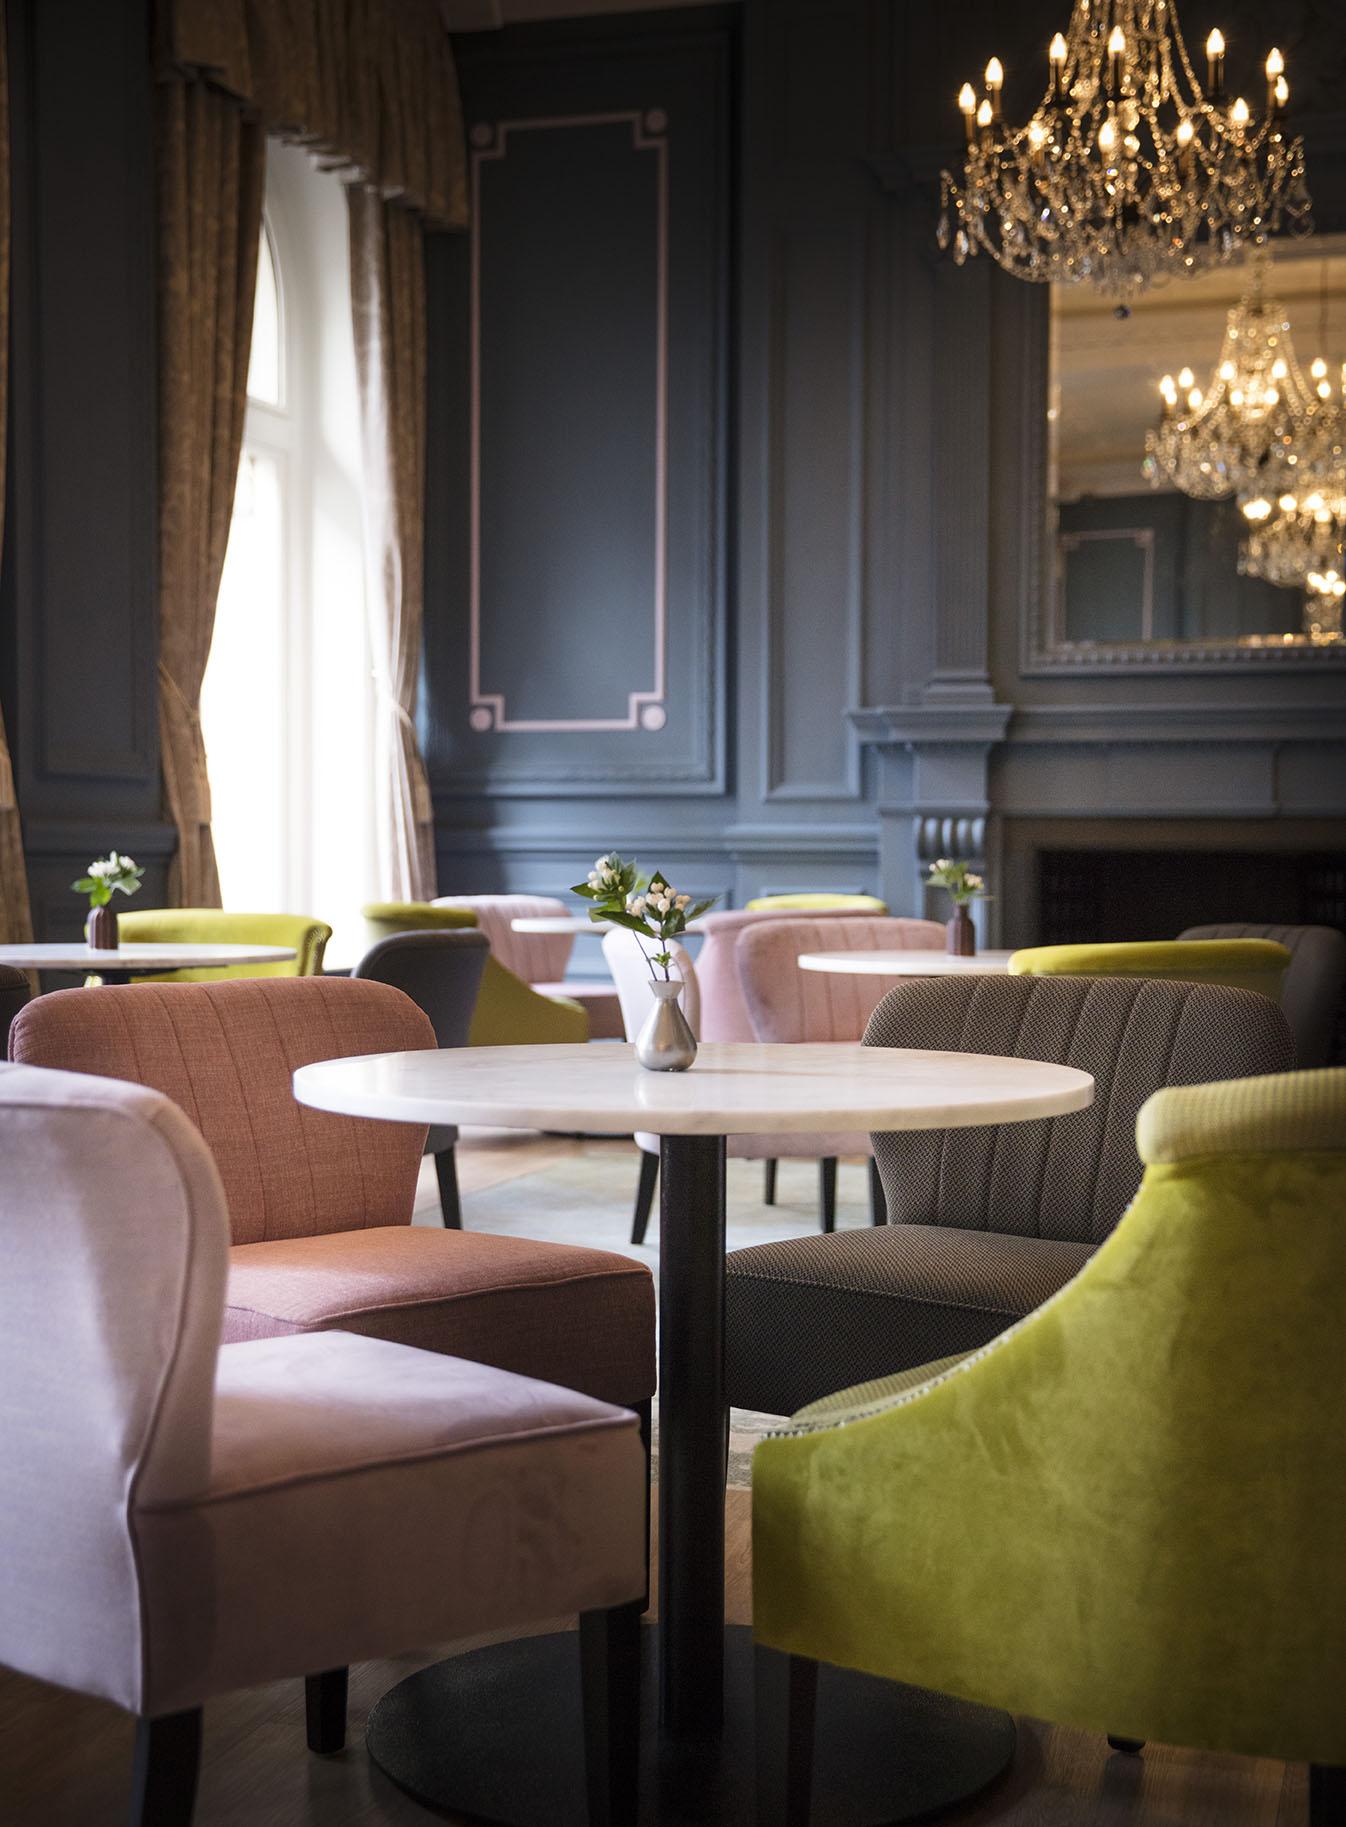 2 - The Tea Lounge, Grosvenor Hotel, London by MAS